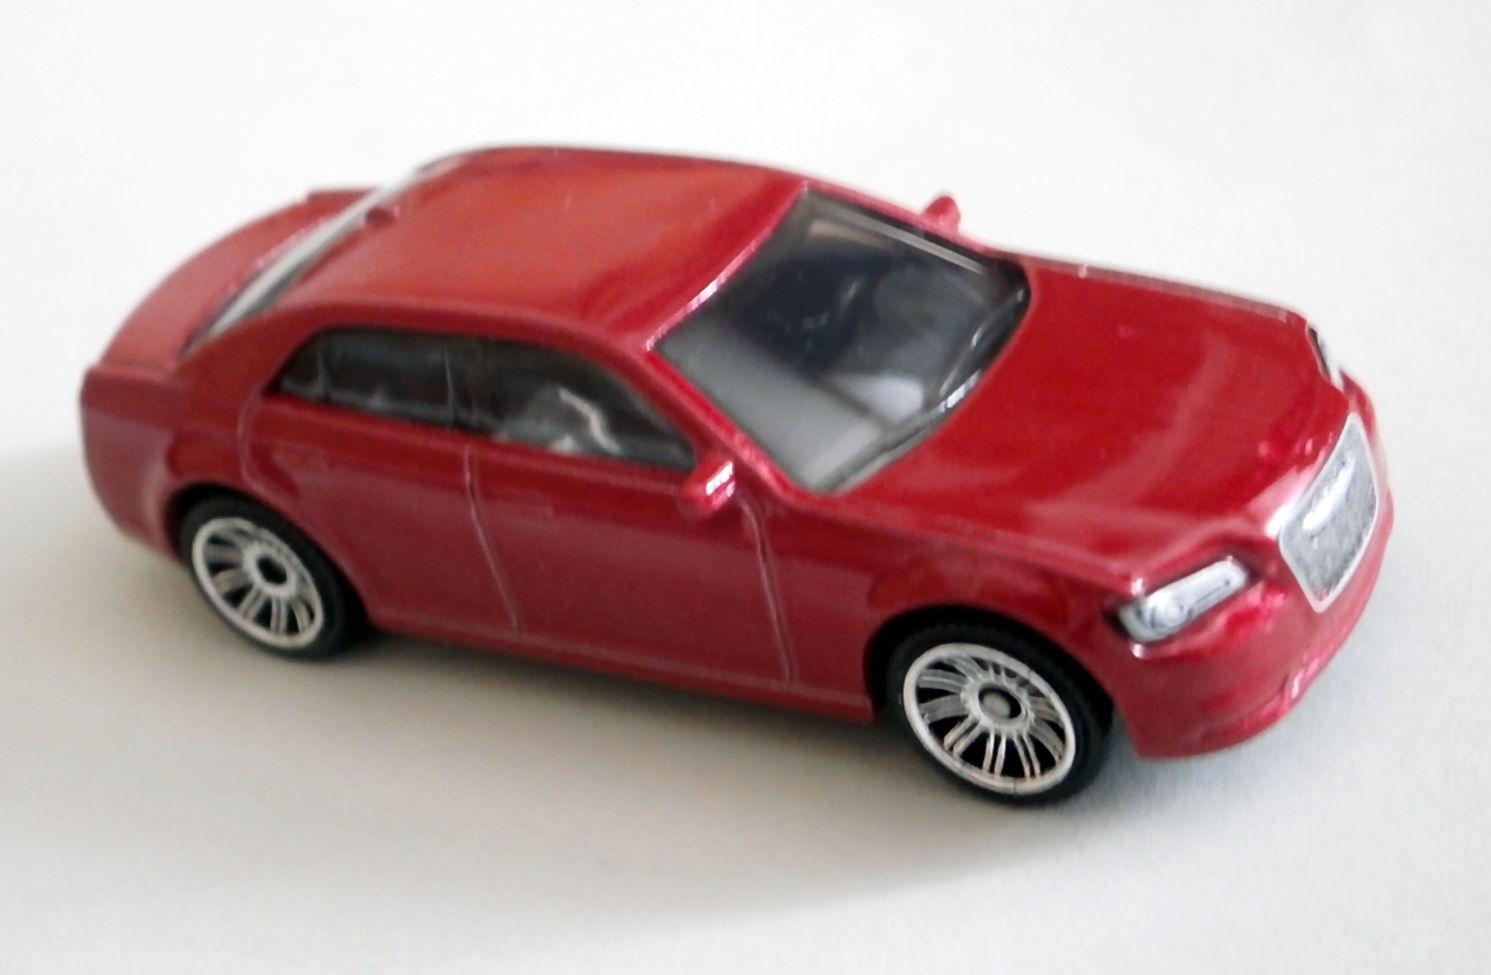 it but quite same chrysler here red looks image s not sedan the